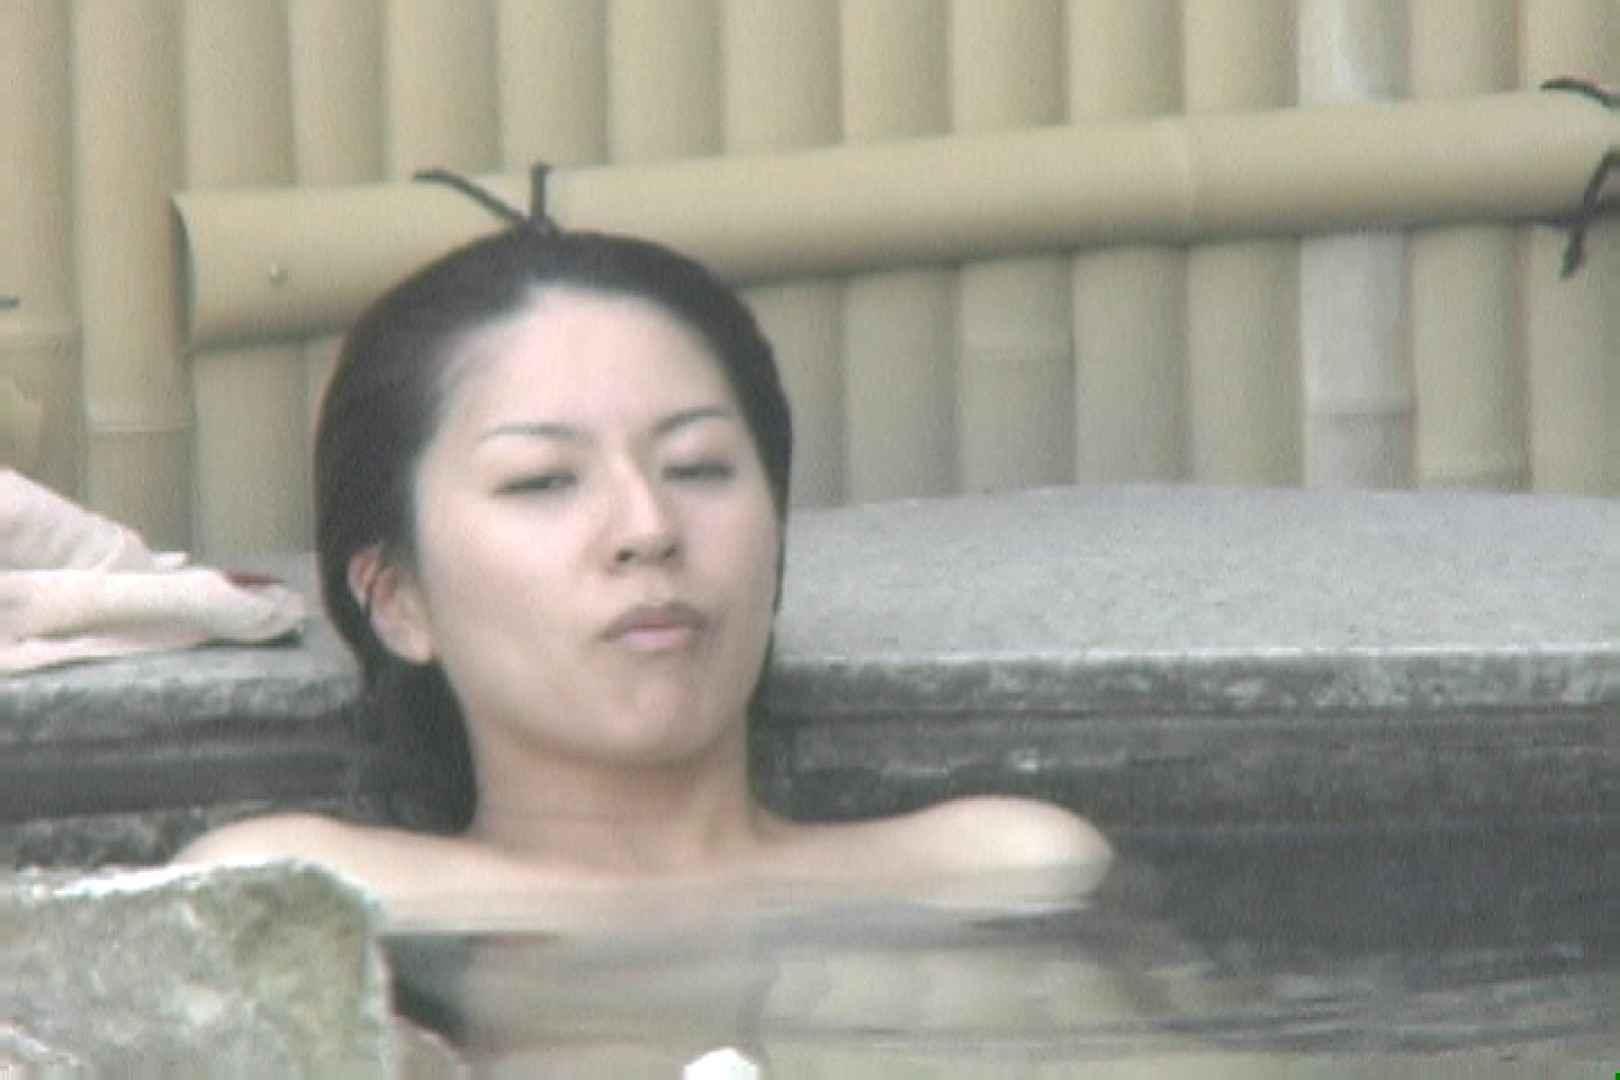 Aquaな露天風呂Vol.694 露天 | OLセックス  67画像 25